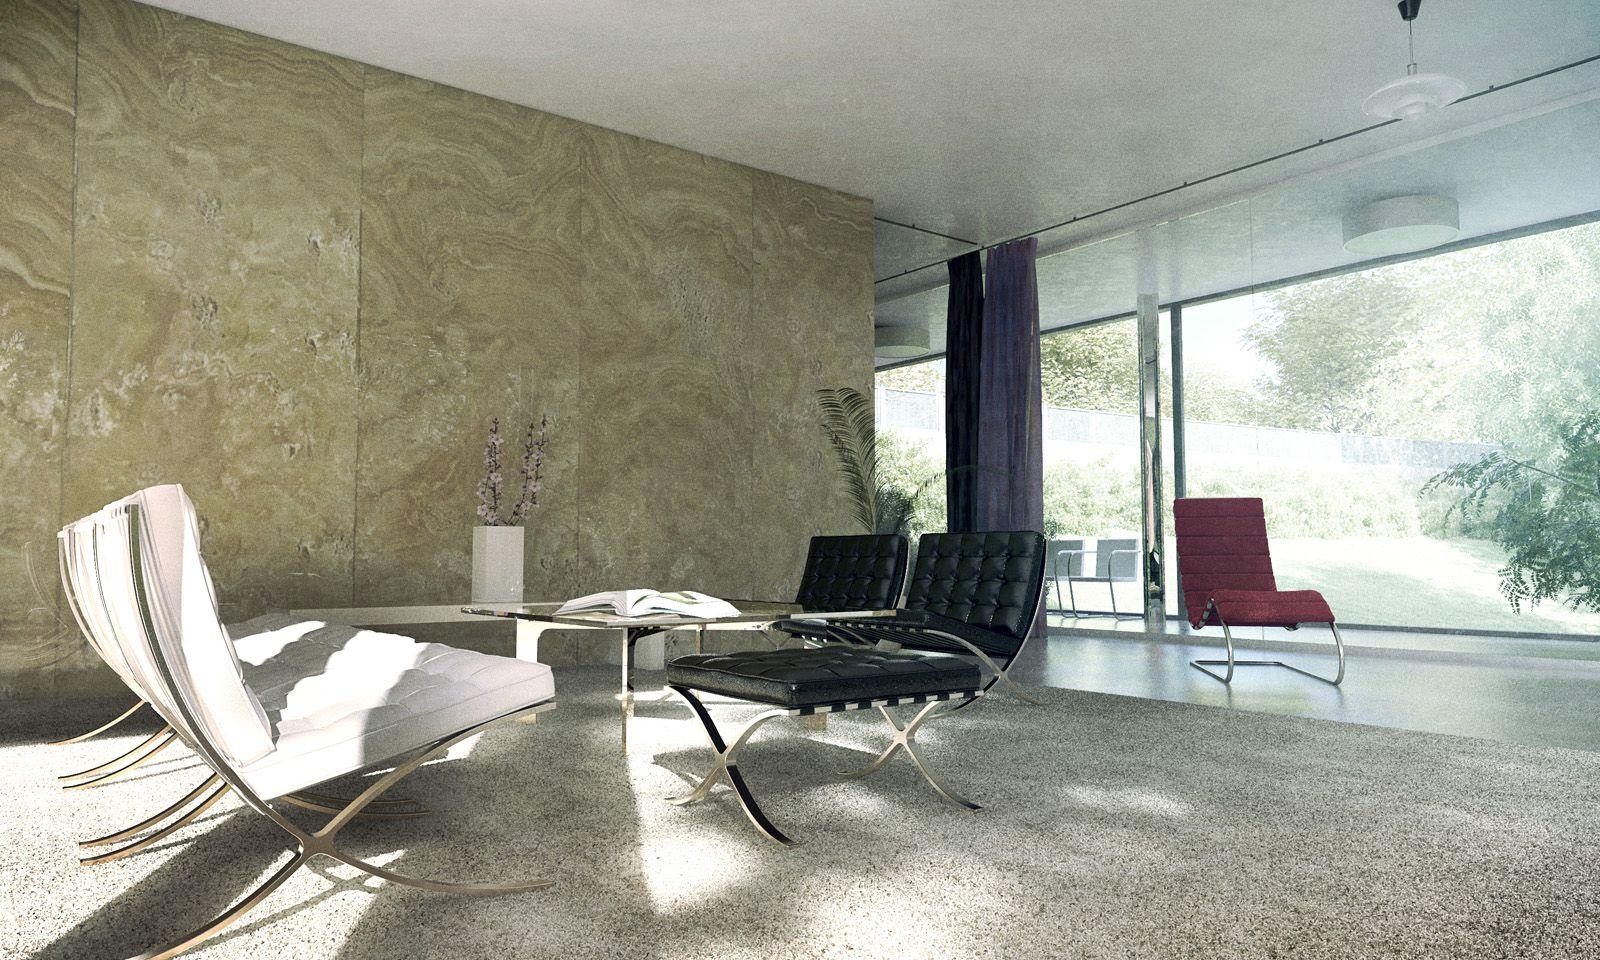 Mies van der rohe a f a s i a for Design apartment udolni brno